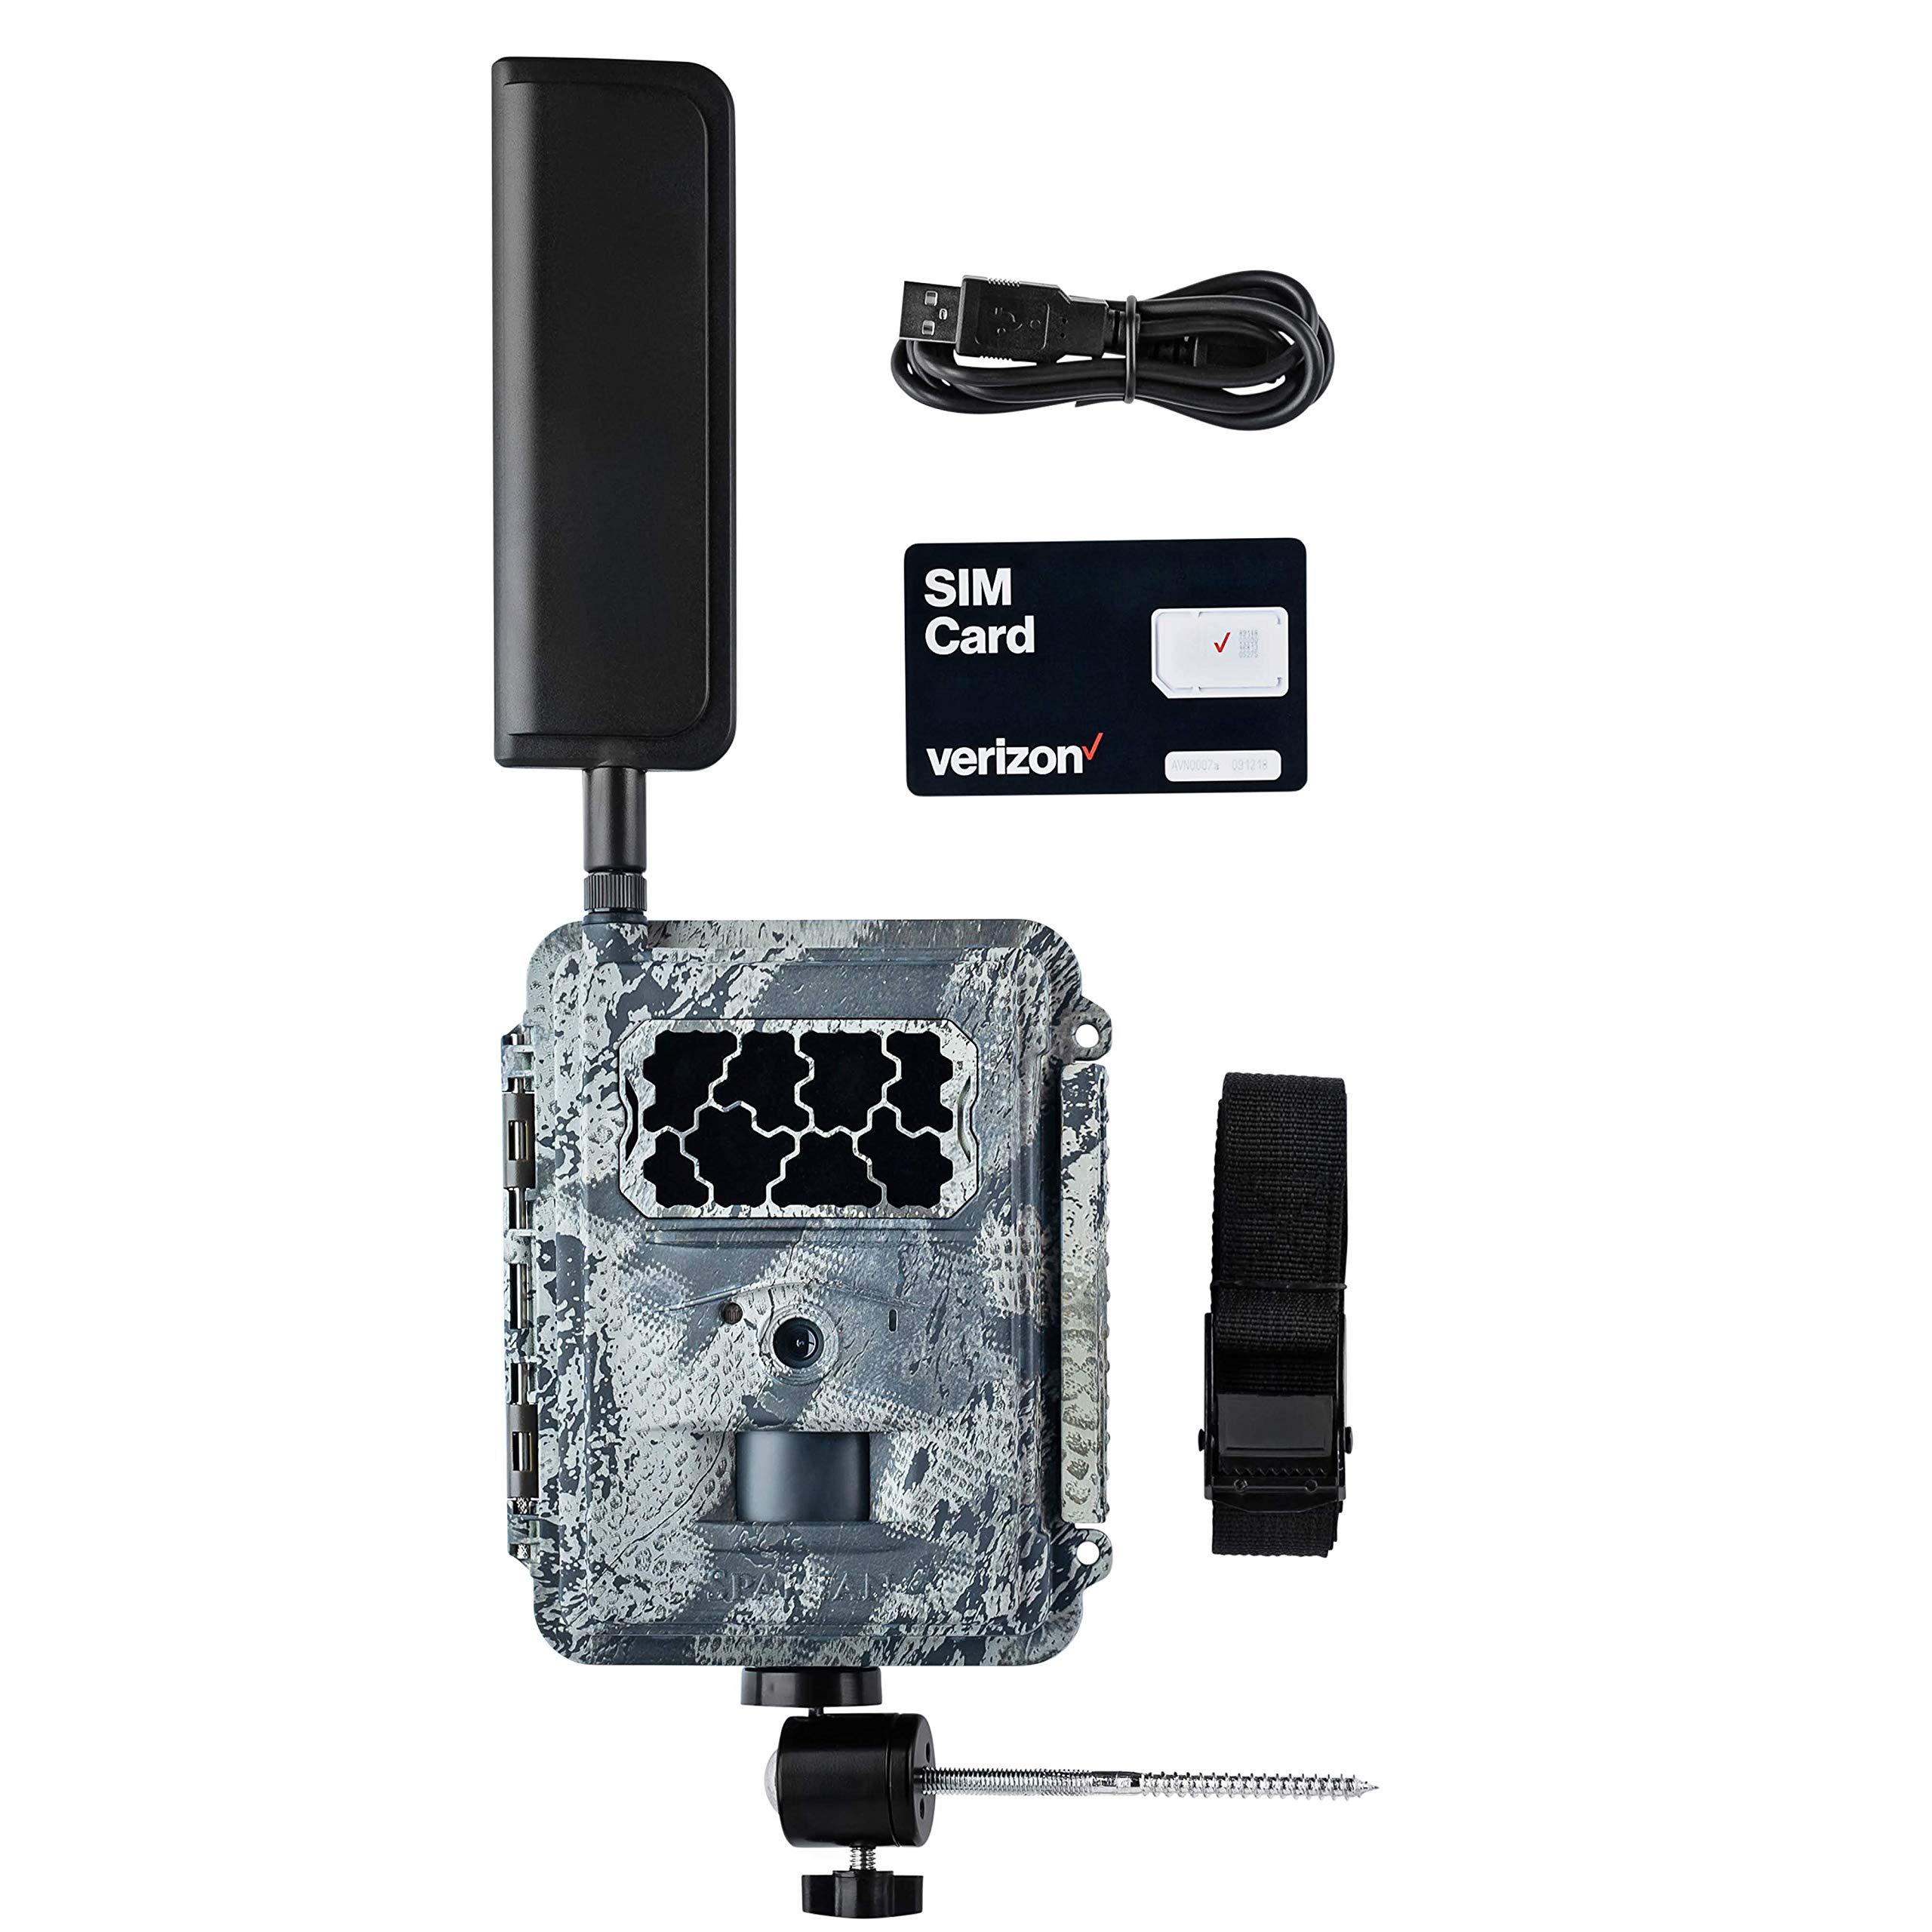 Spartan 4G LTE Wireless GoCam Trail Camera with Freedom Mount (Verizon LTE, Areus Camo Infrared)